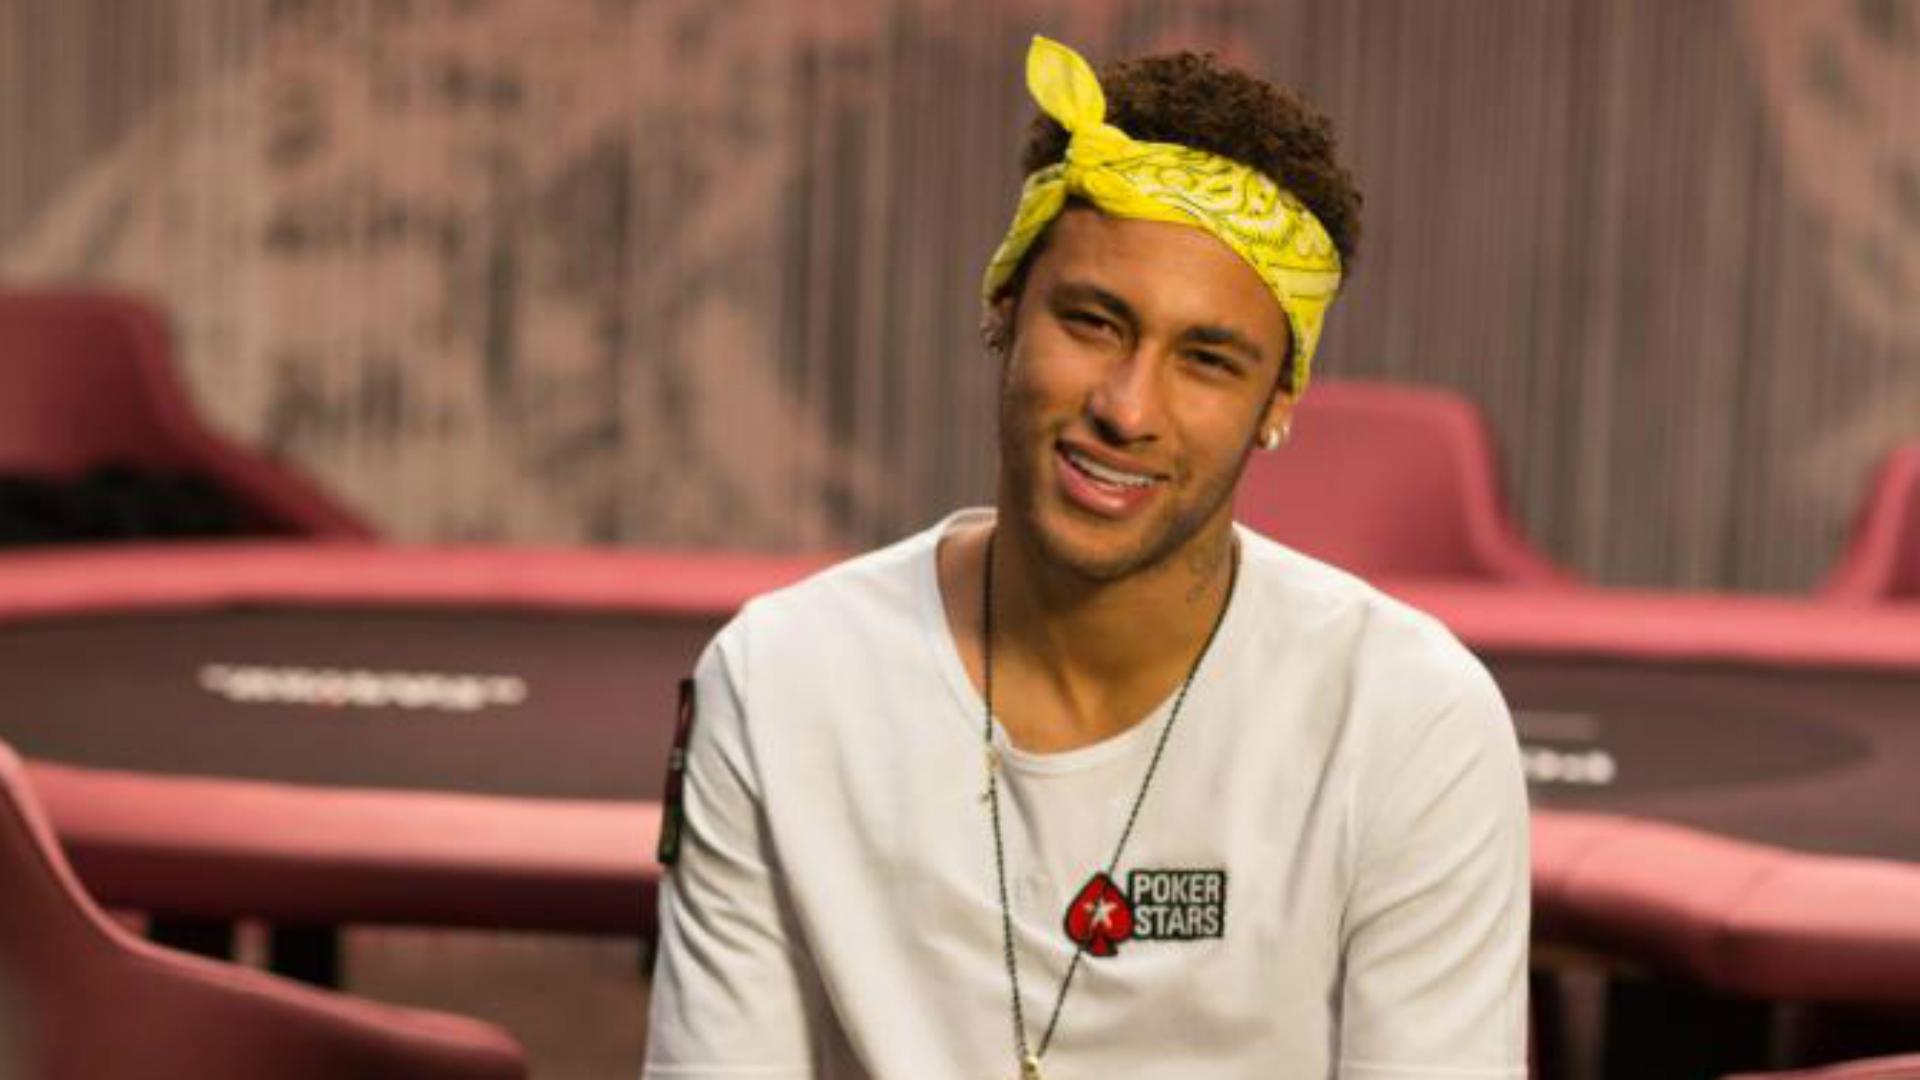 Neymar Barcelona pokerstars